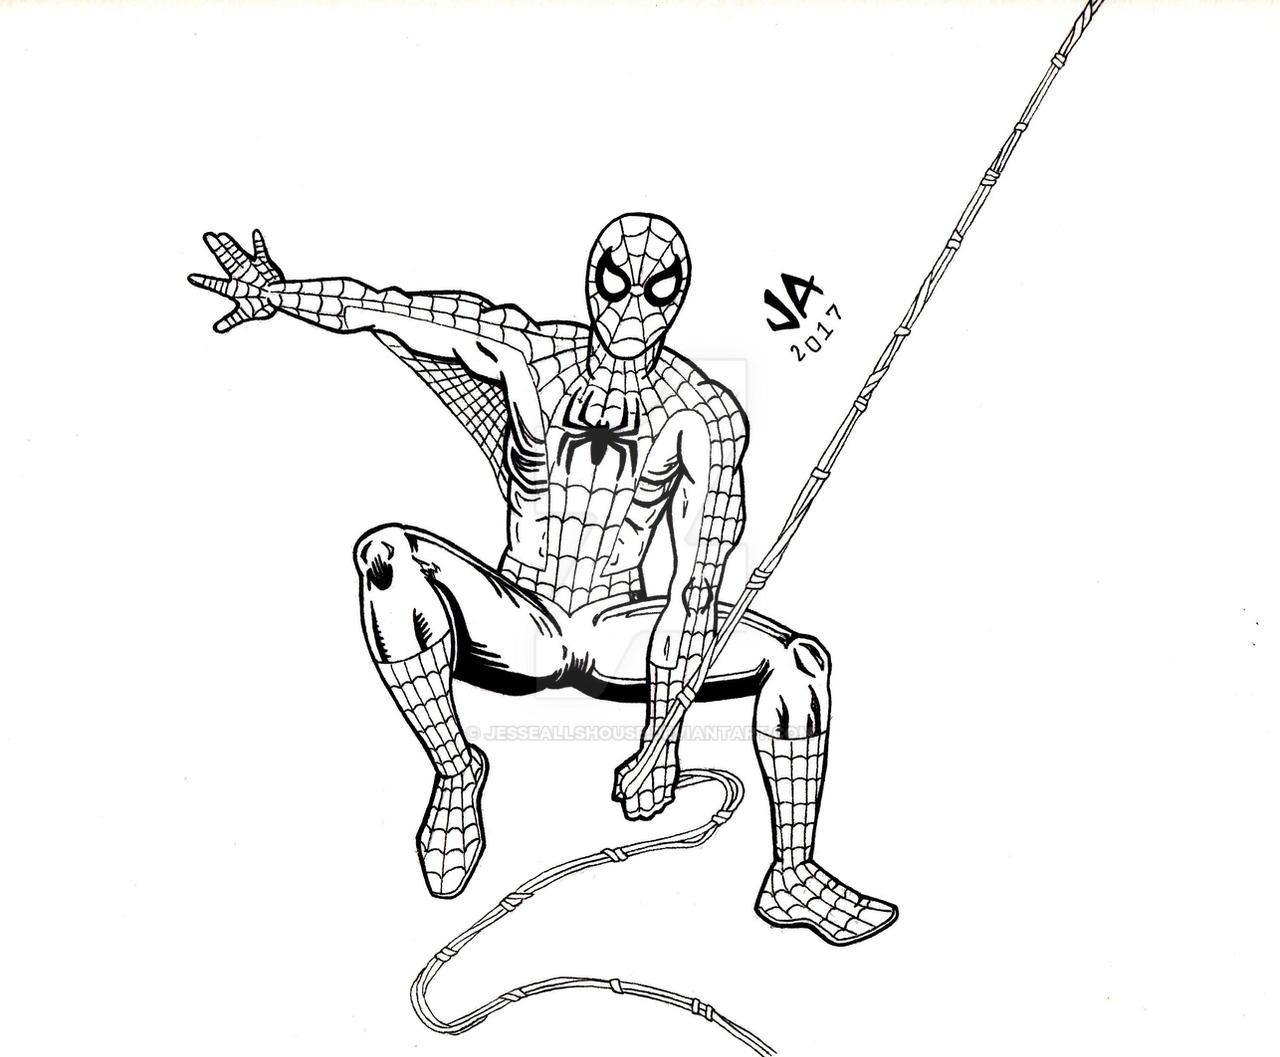 Spider-Man Pen and Ink by JesseAllshouse